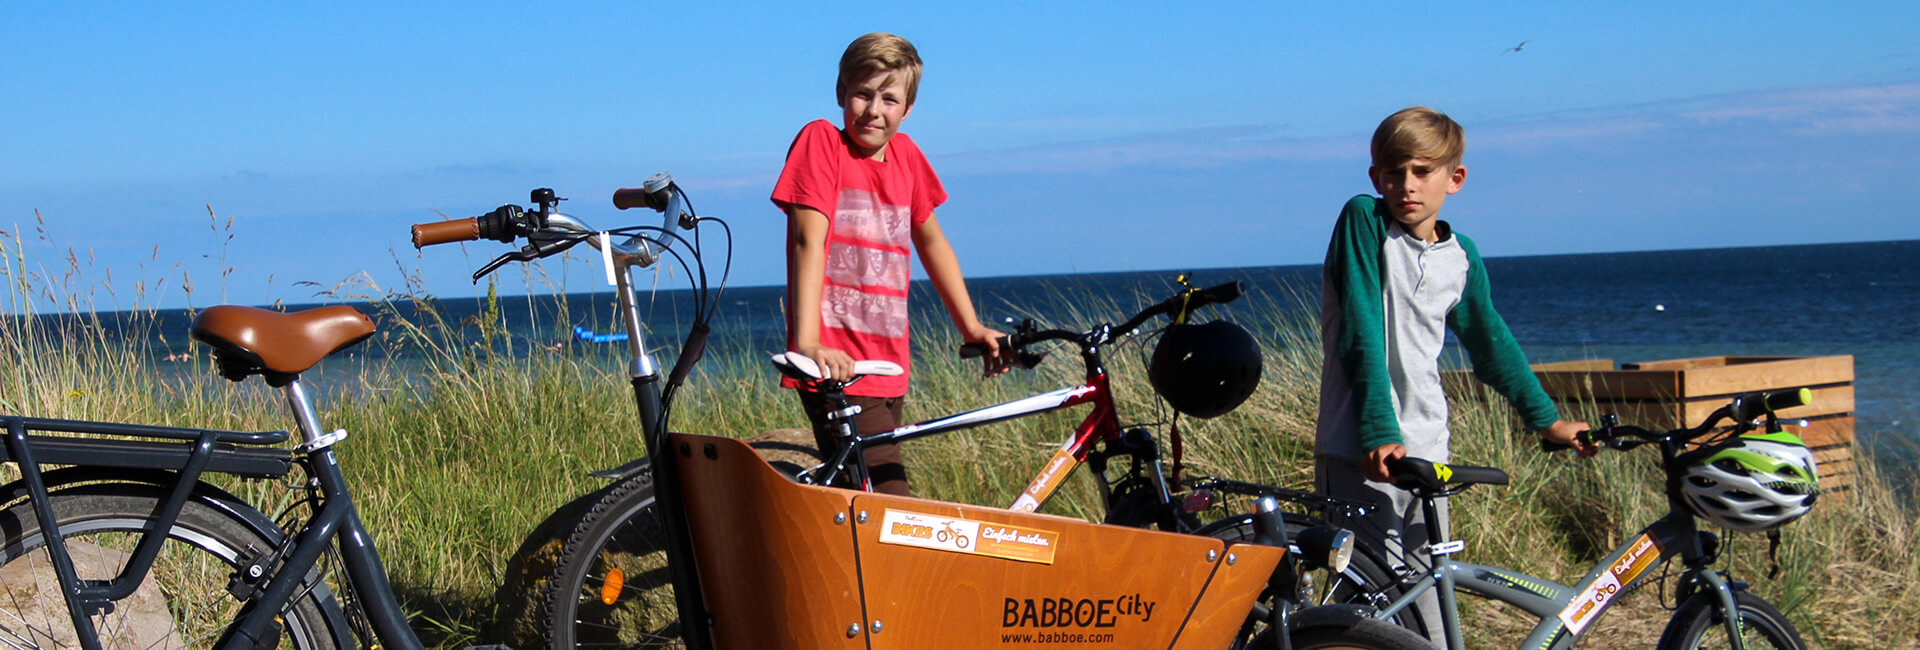 Fahrradpause am Strand